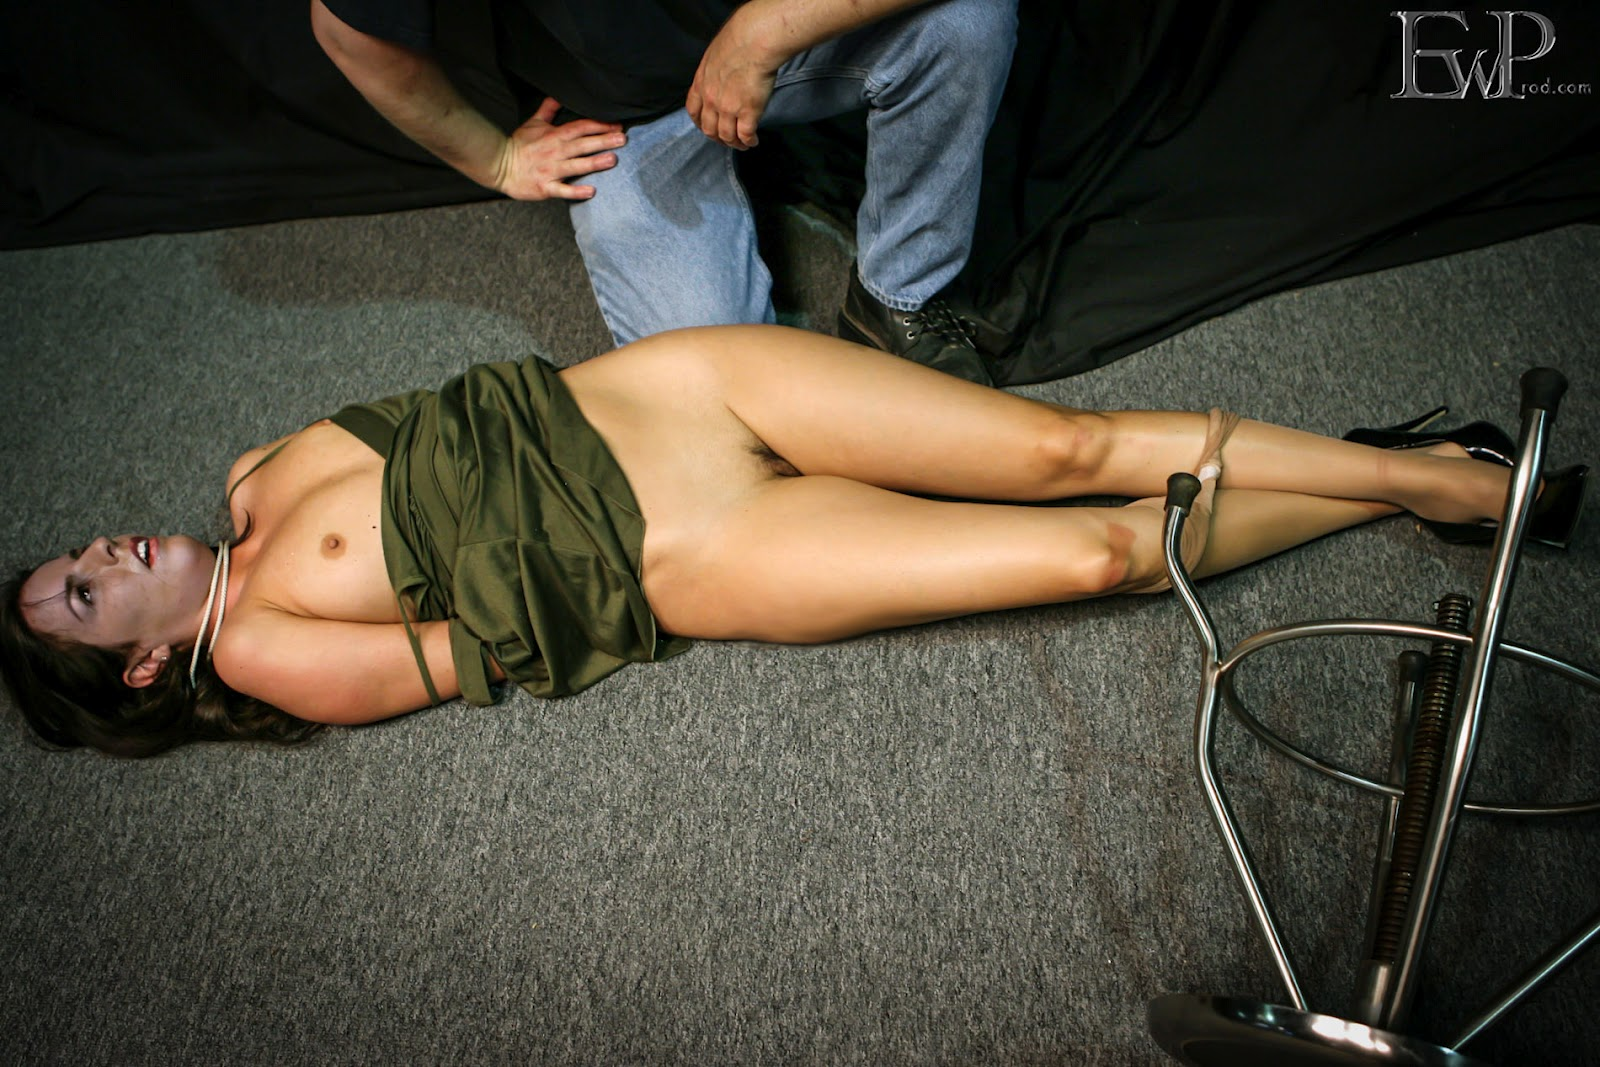 Snuff girl hanged that interrupt